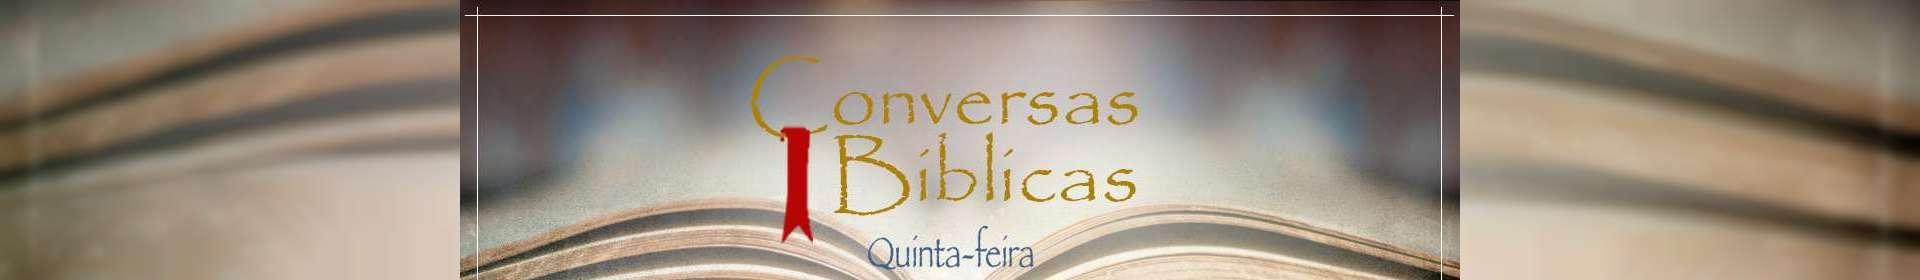 Conversas Bíblicas: Jerusalém - Parte 1